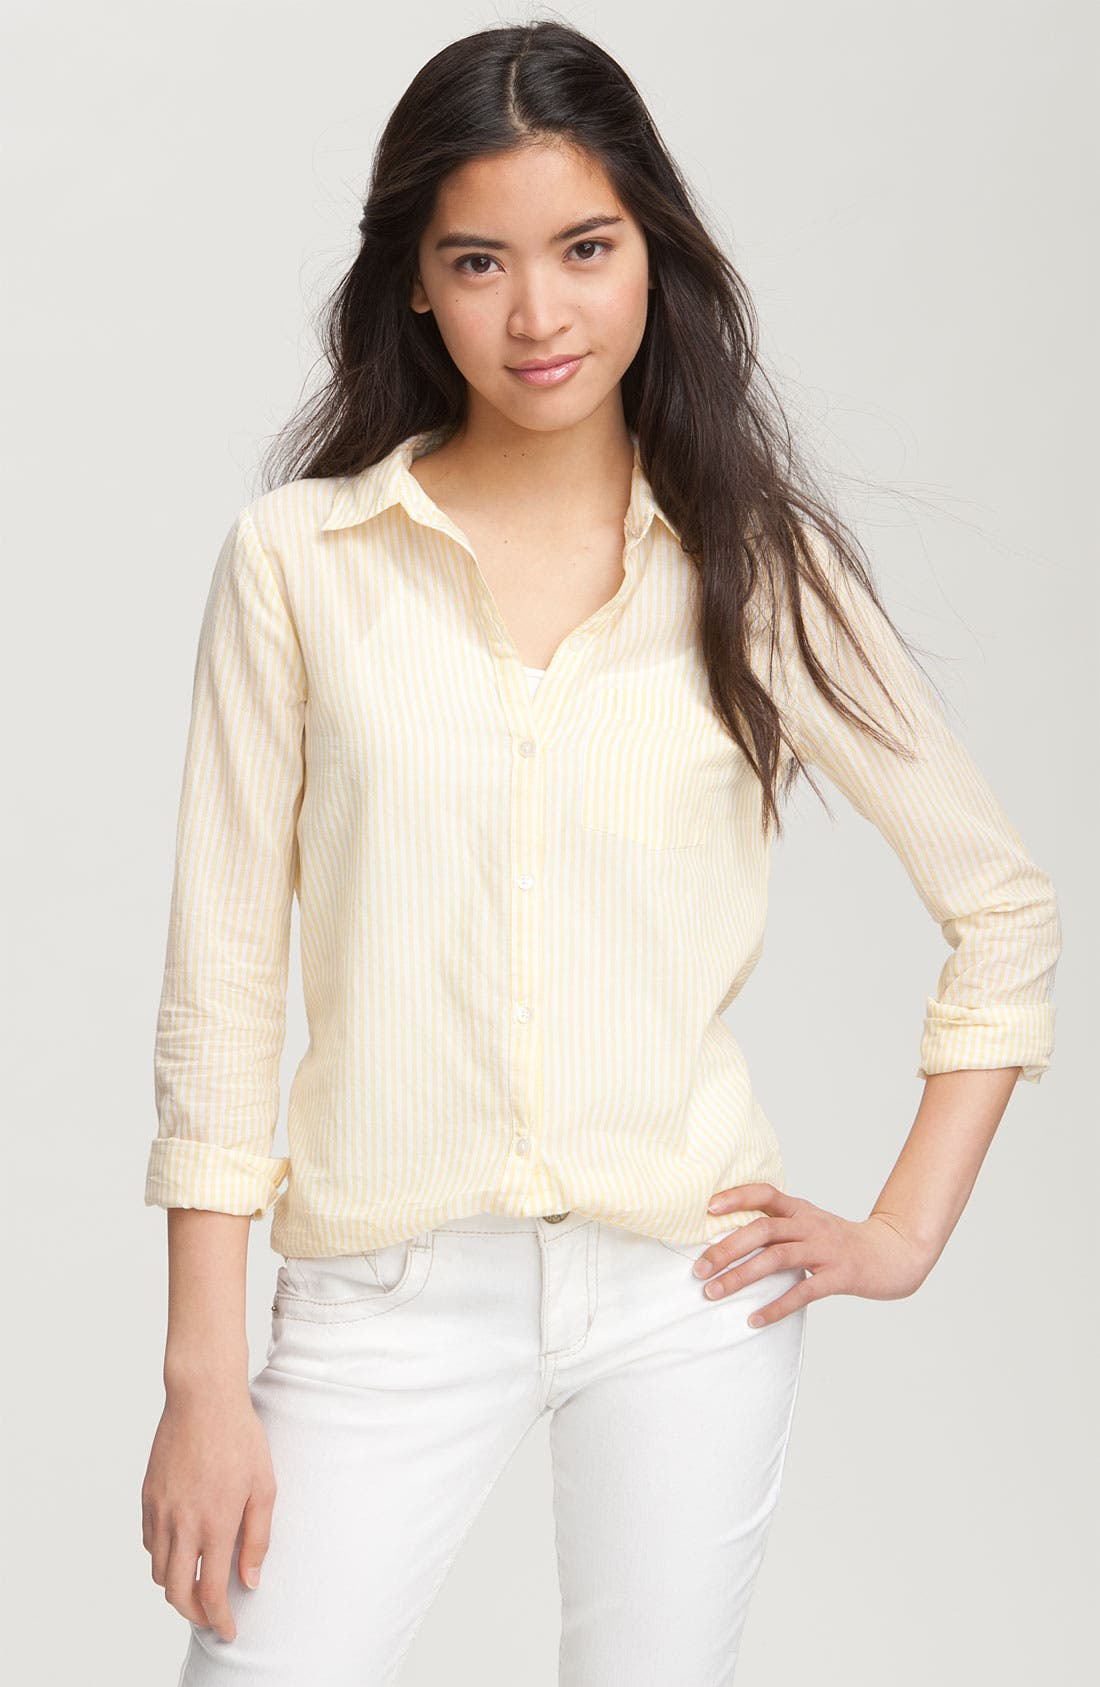 Alternate Image 1 Selected - BP. 'Preppy' Cotton Shirt (Juniors)